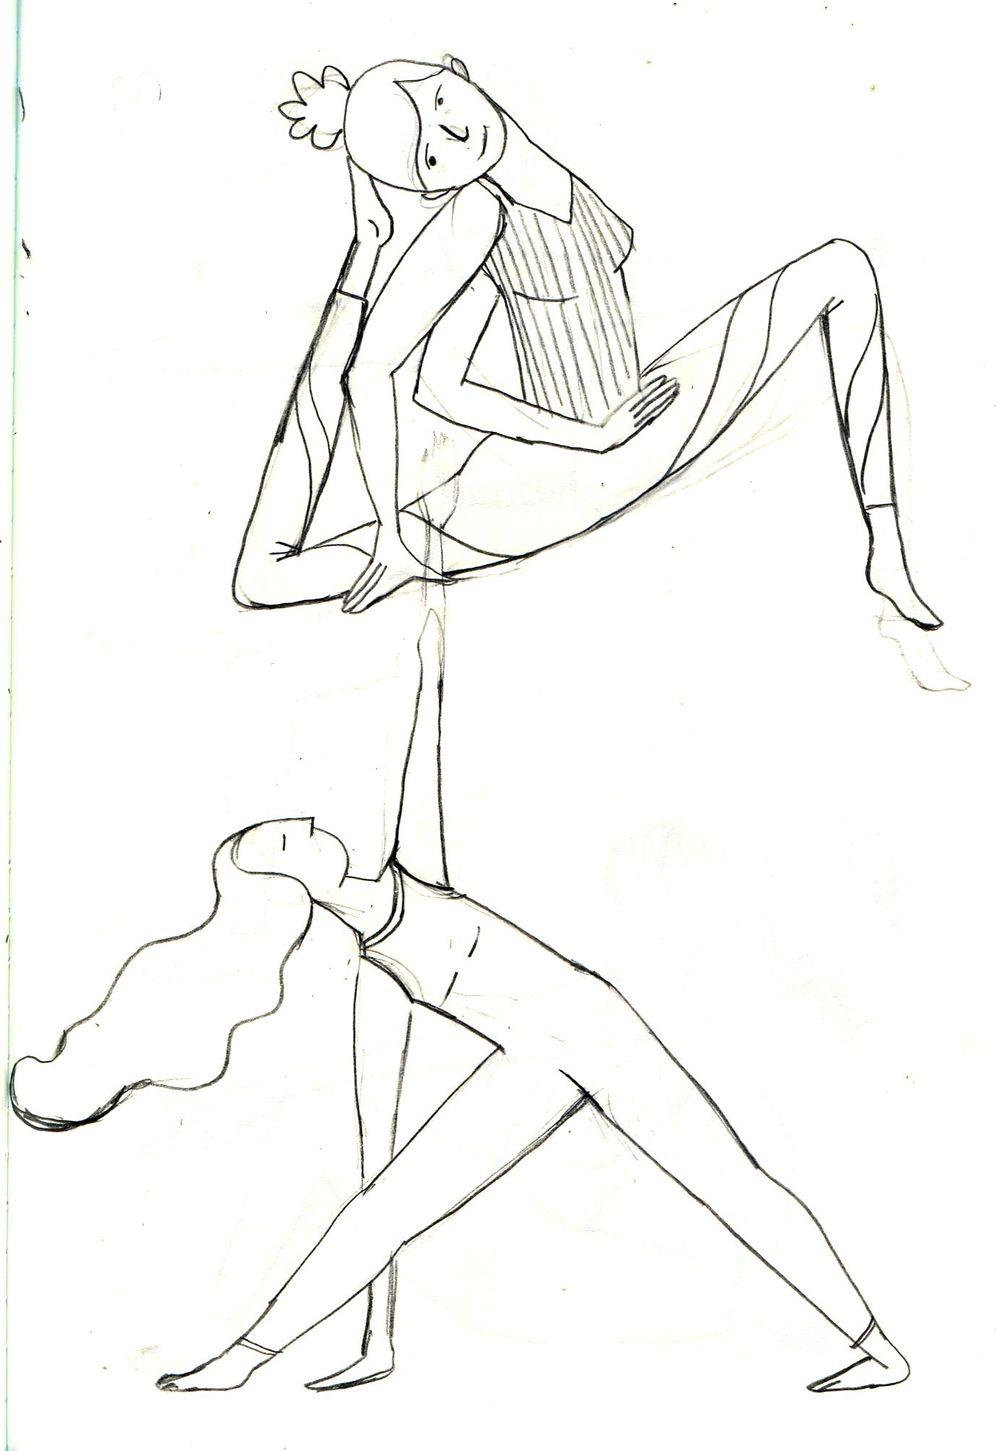 Vesushi's Odd Bodies - image 2 - student project